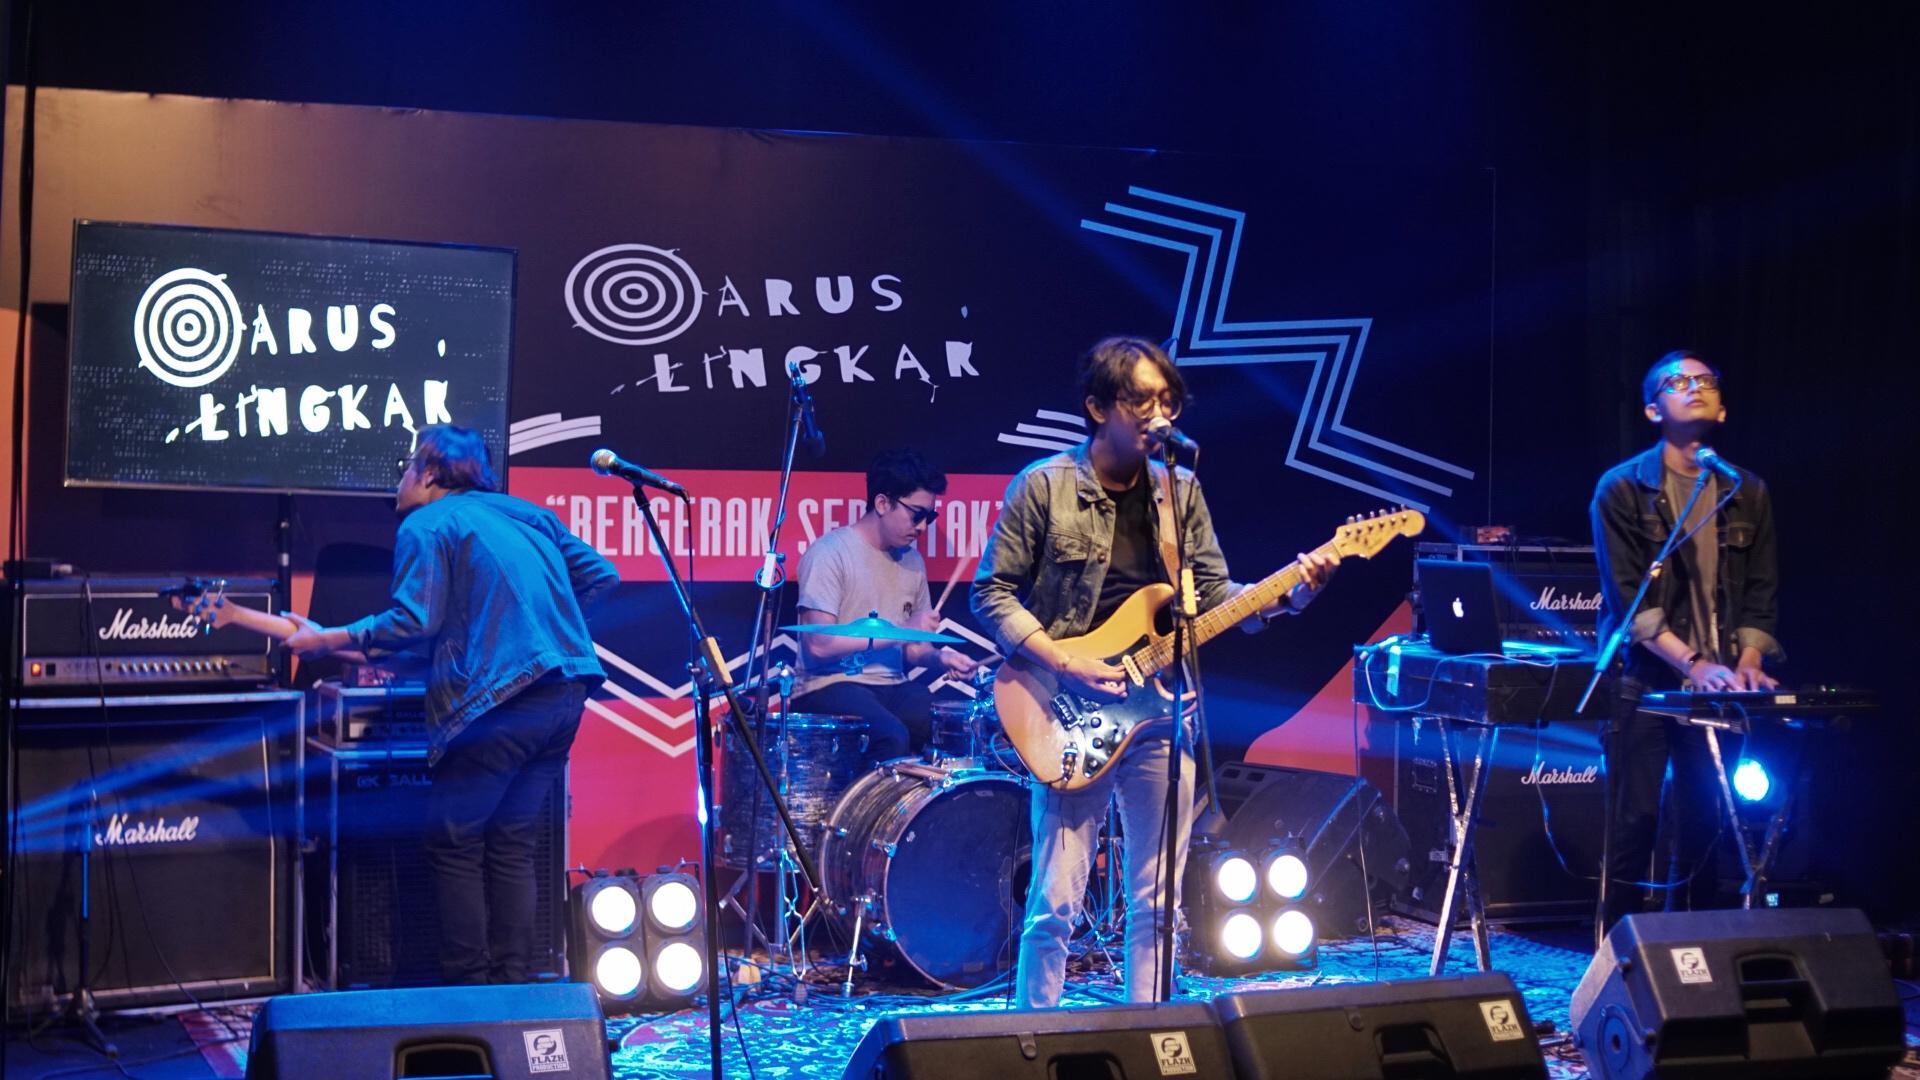 Diandras Live di Arus Lingkar